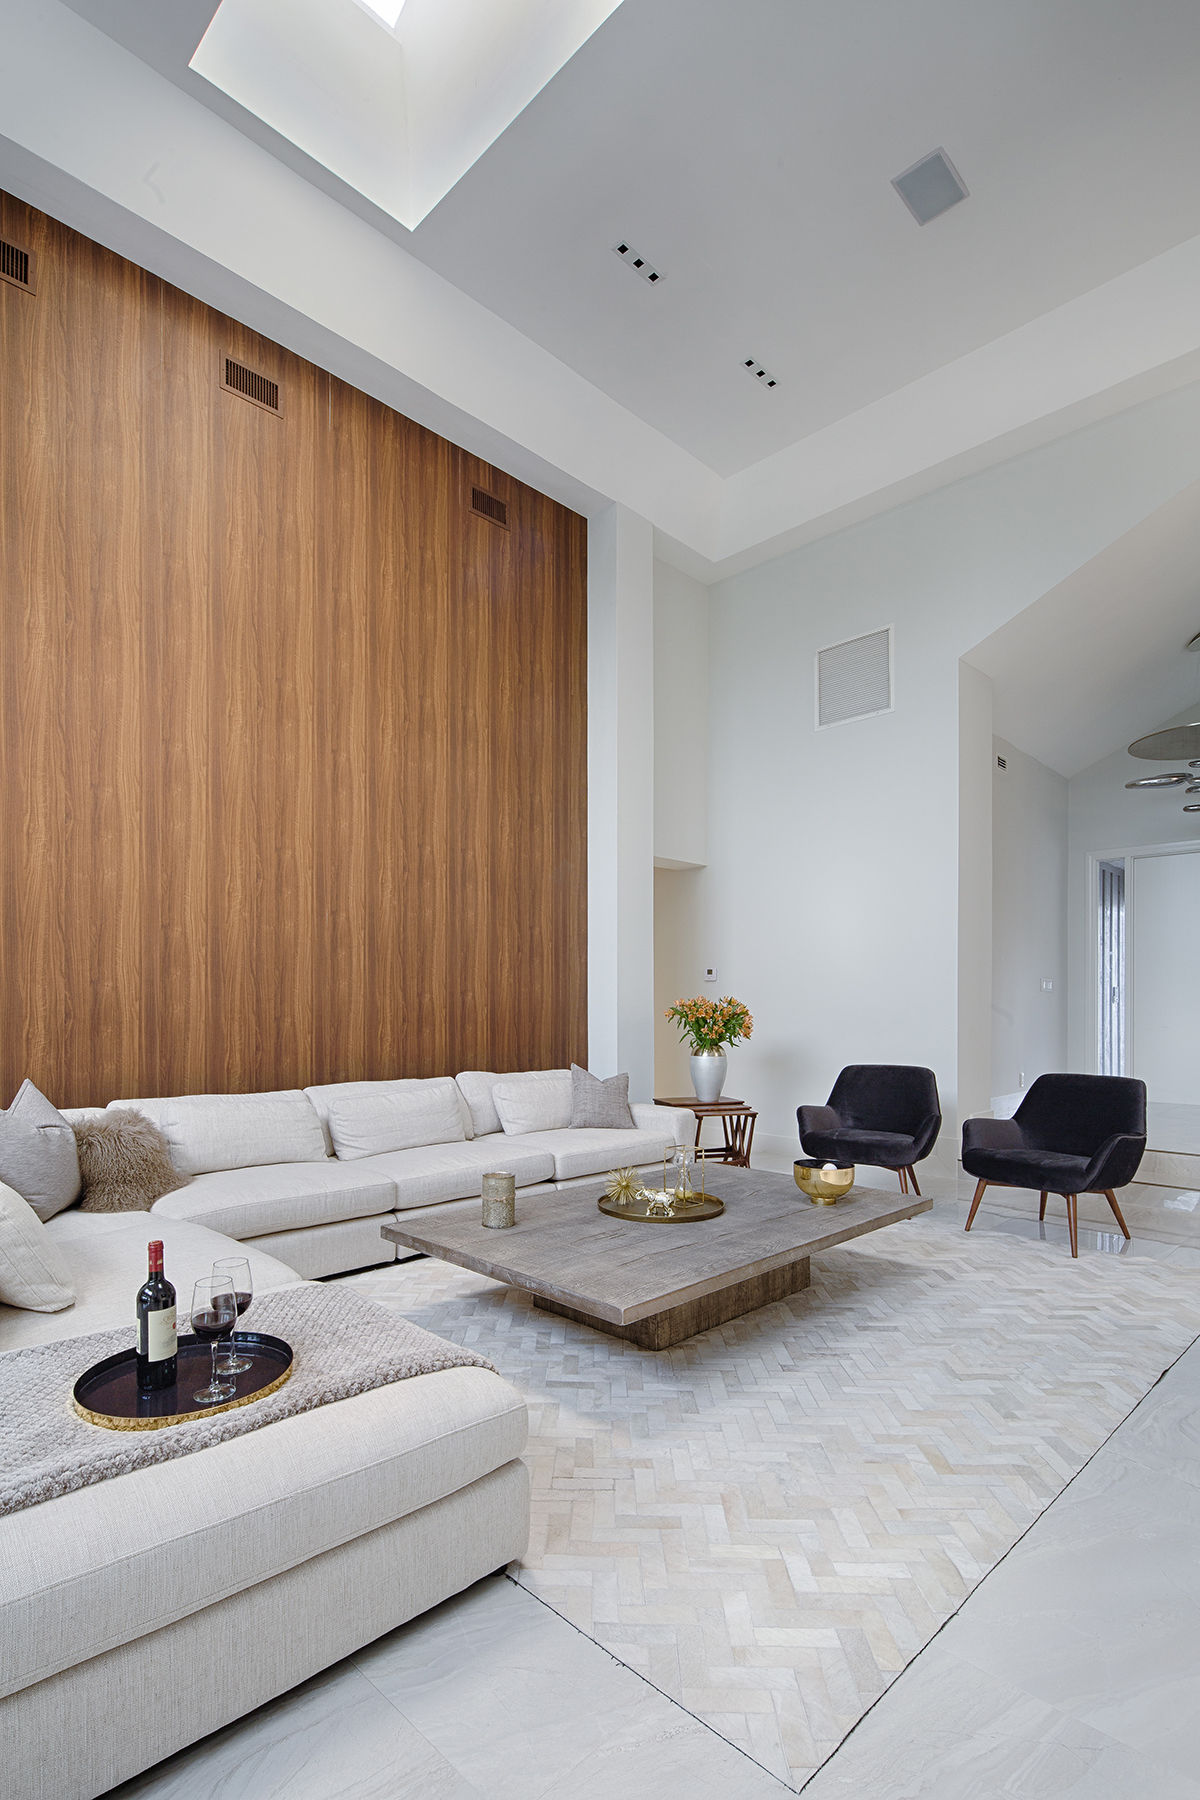 Contemporary Interior Design in West Boca Raton, Fl, Rooms by Eve, Eve Joss9.jpg